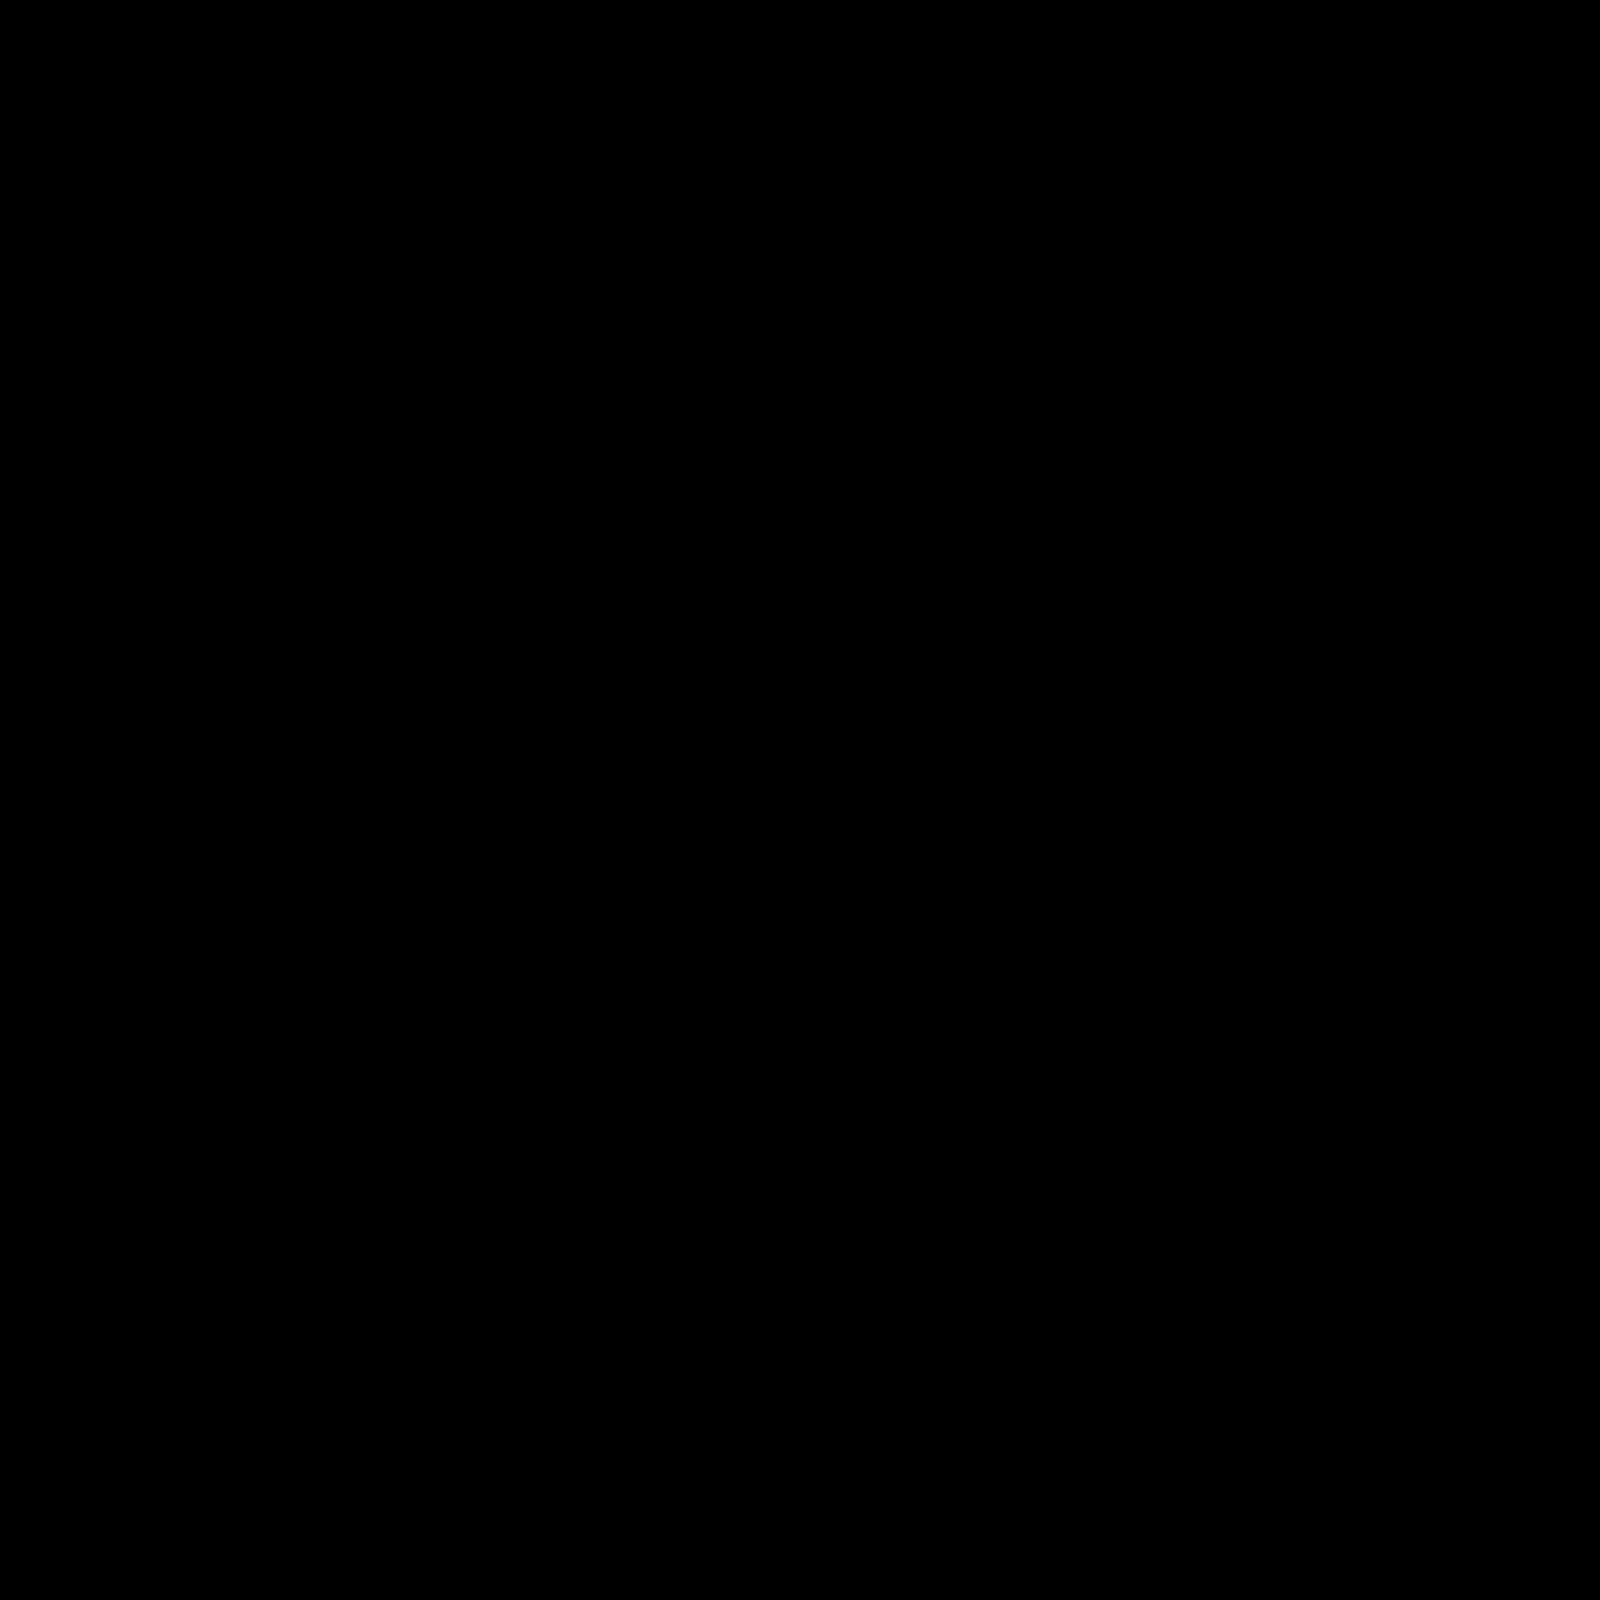 Park rozrywki icon